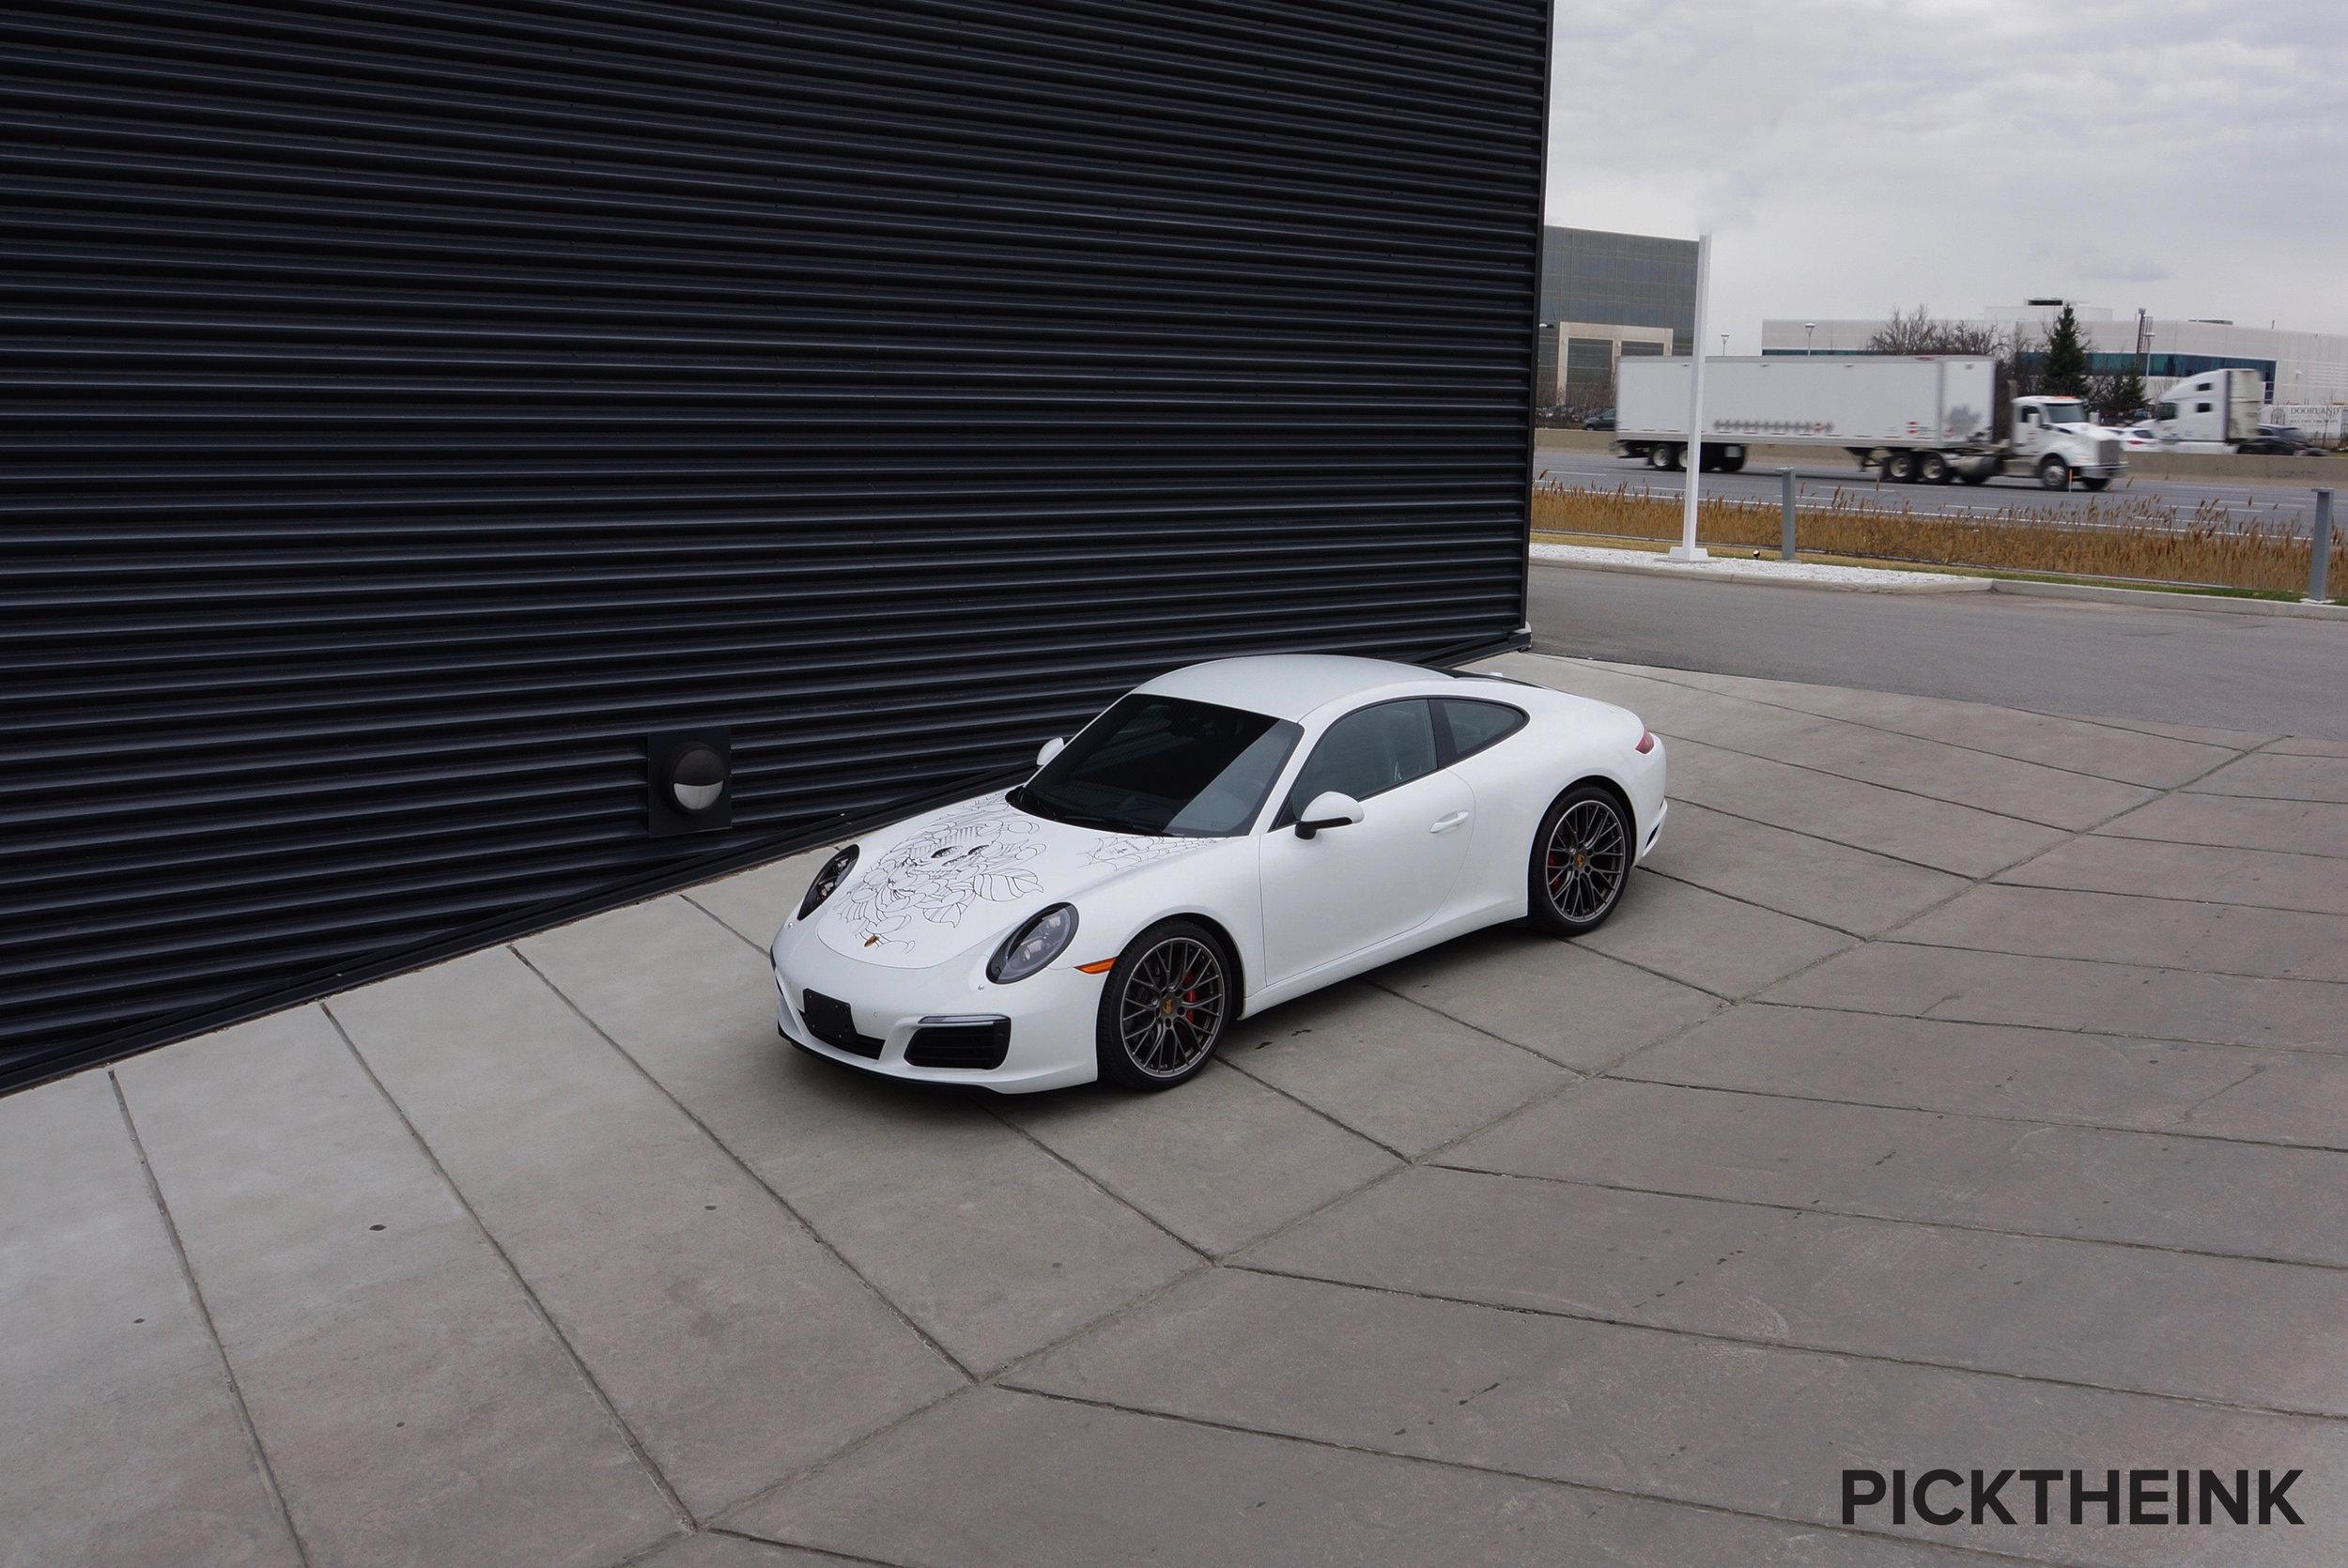 The white Porsche 911